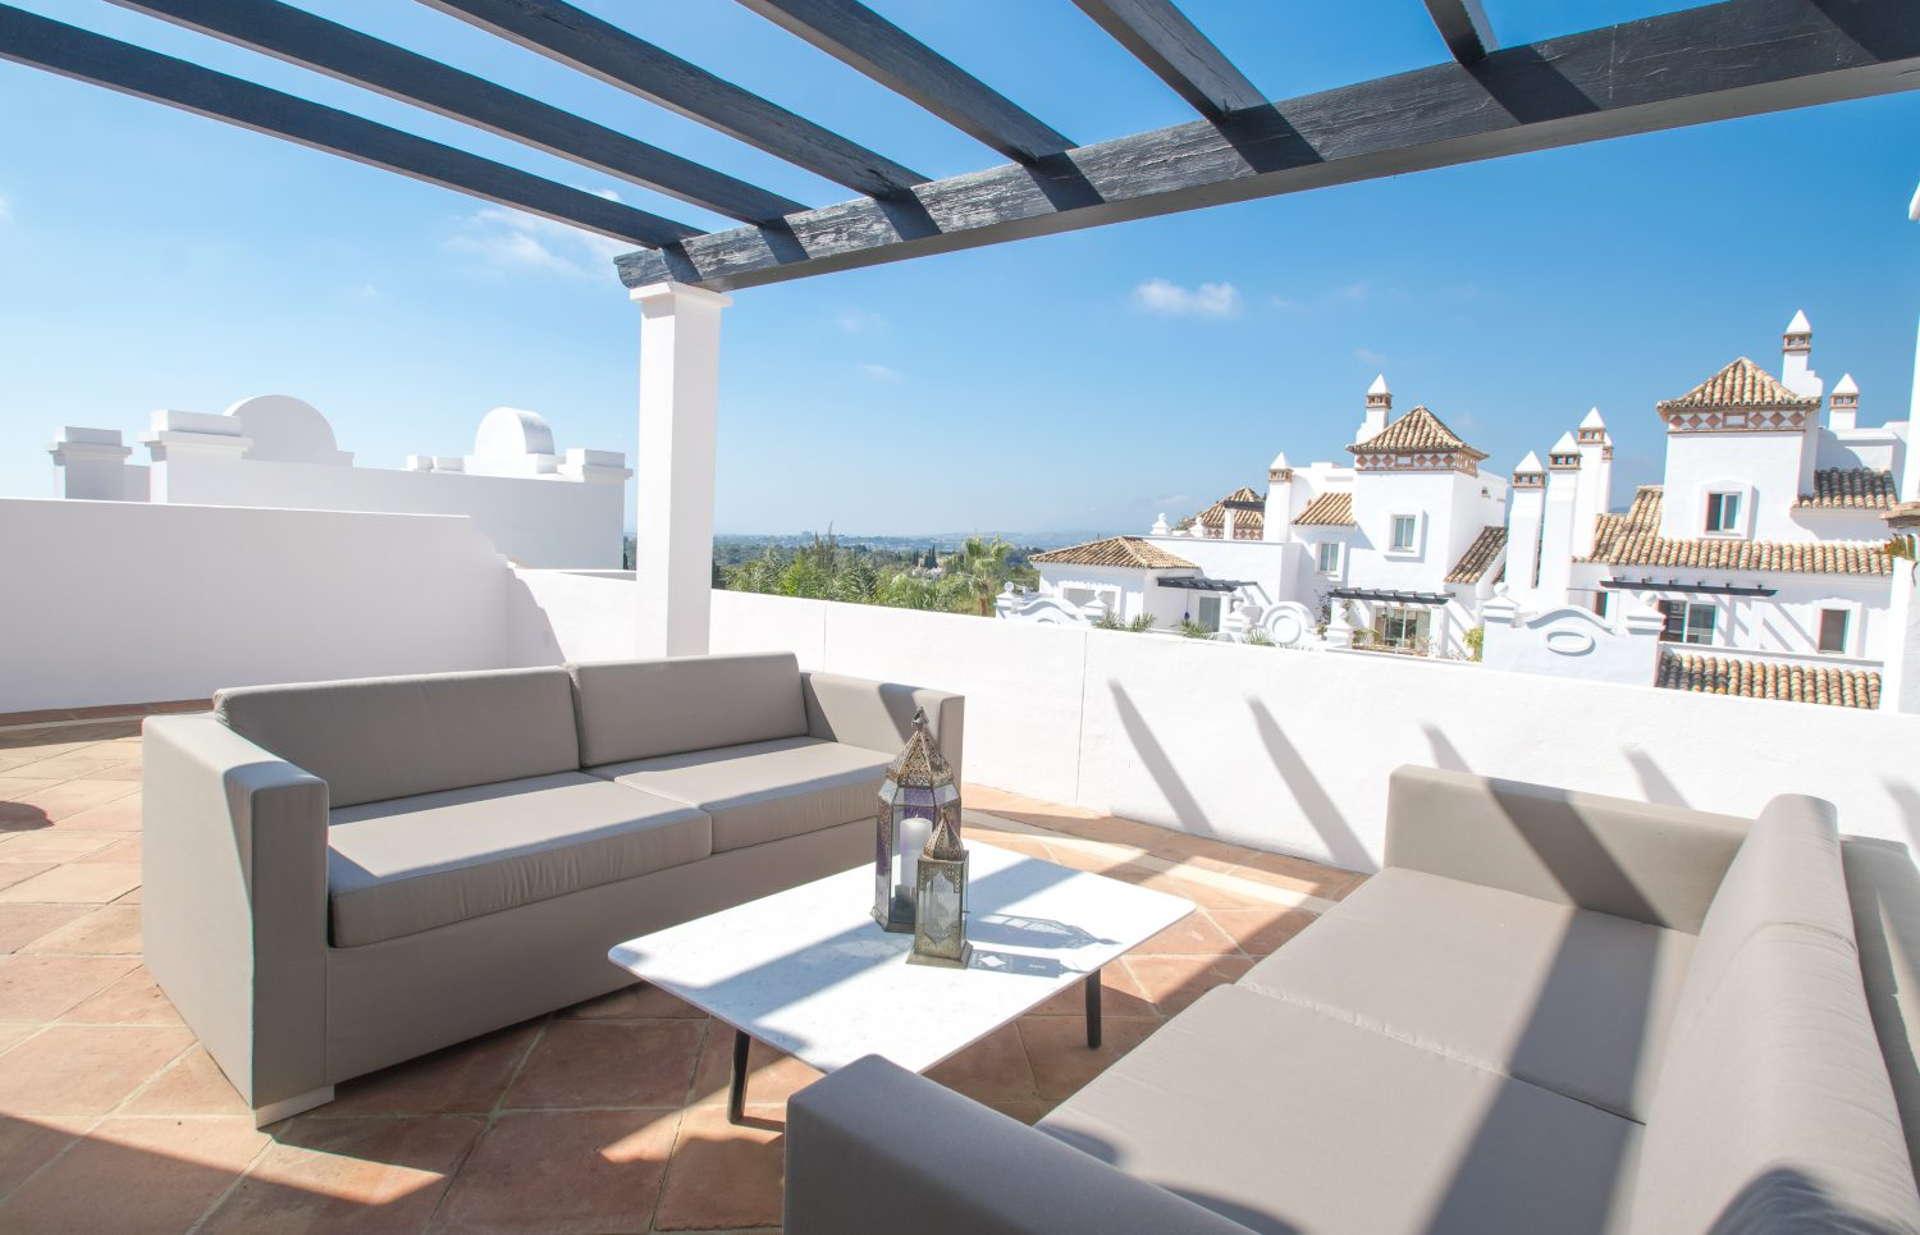 Columbus Hills 3 bedroom apartment in Sierra Blanca Marbella for sale